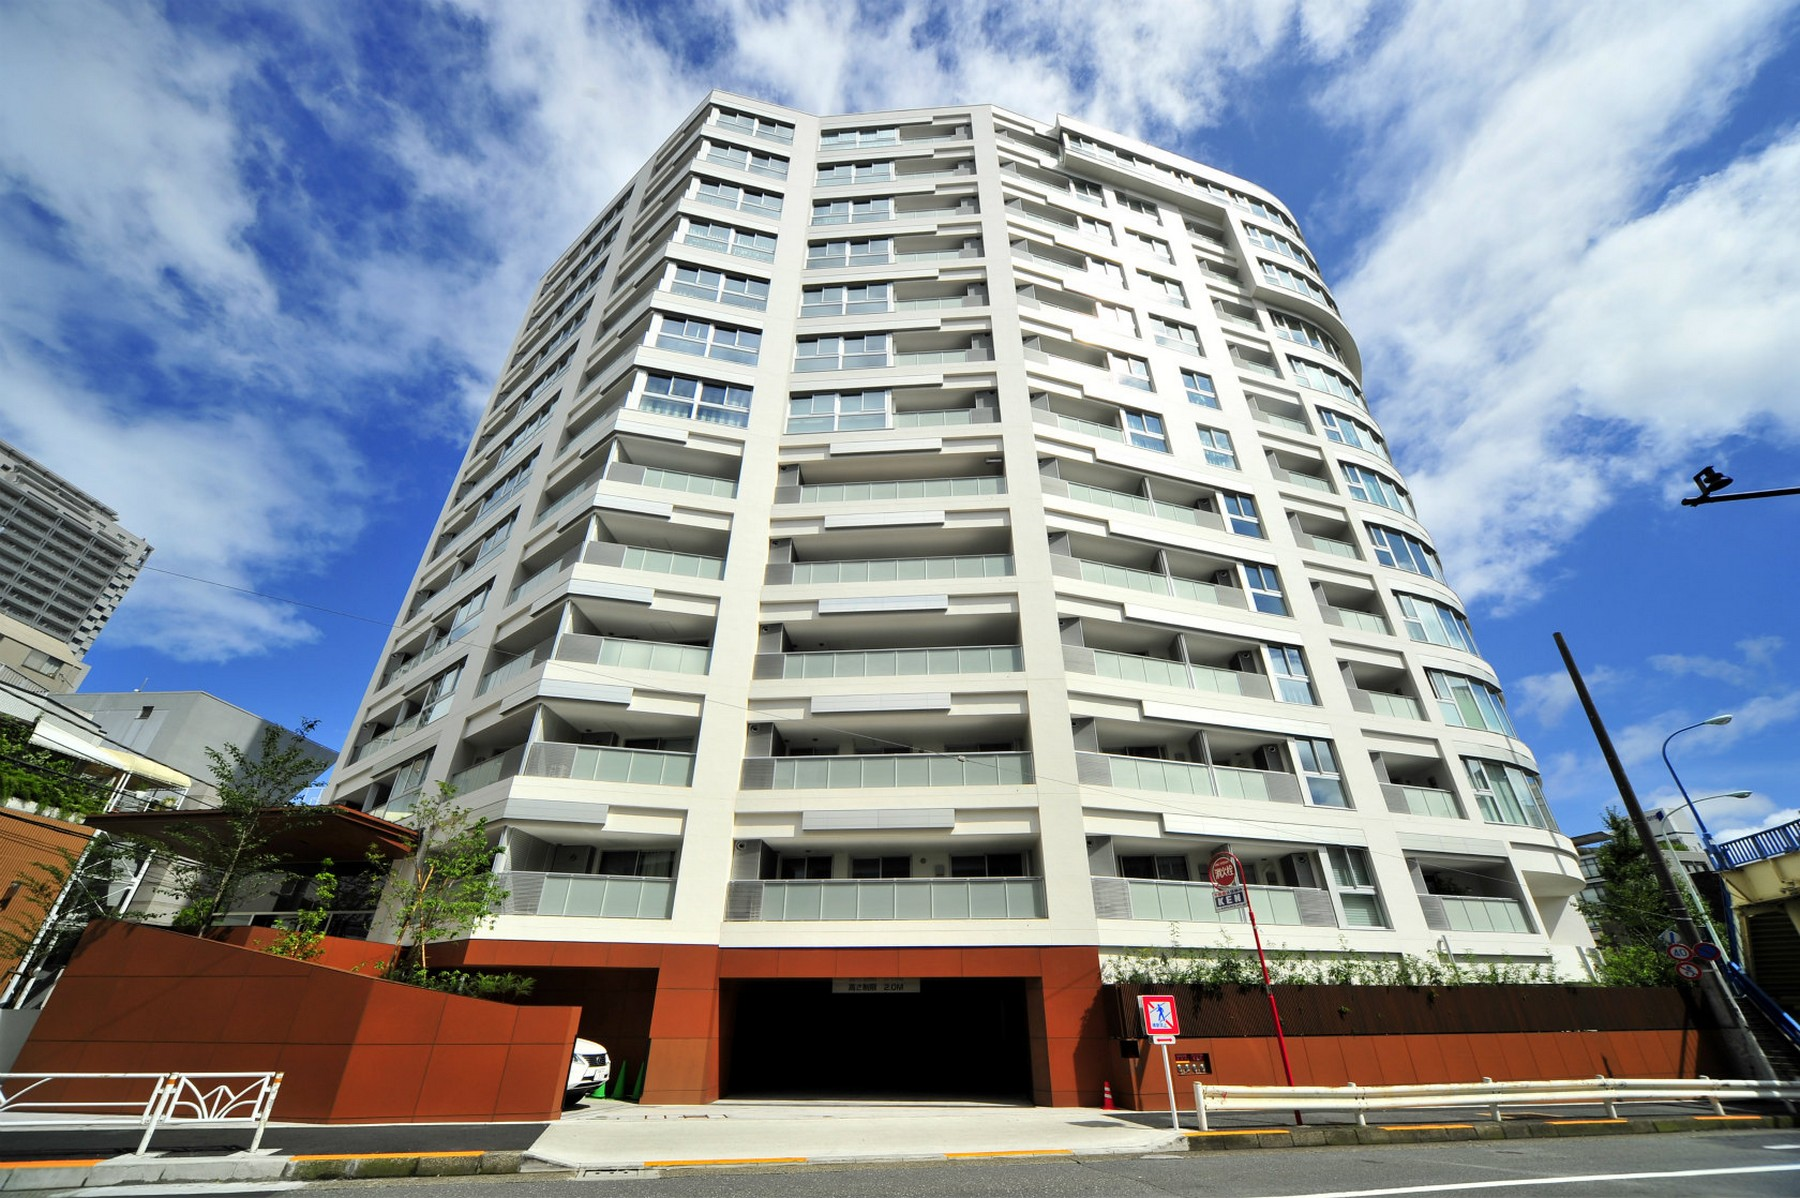 Appartement pour l Vente à The Conoe Daikanyama Hiroo, Shibuya-Ku, Tokyo Japon